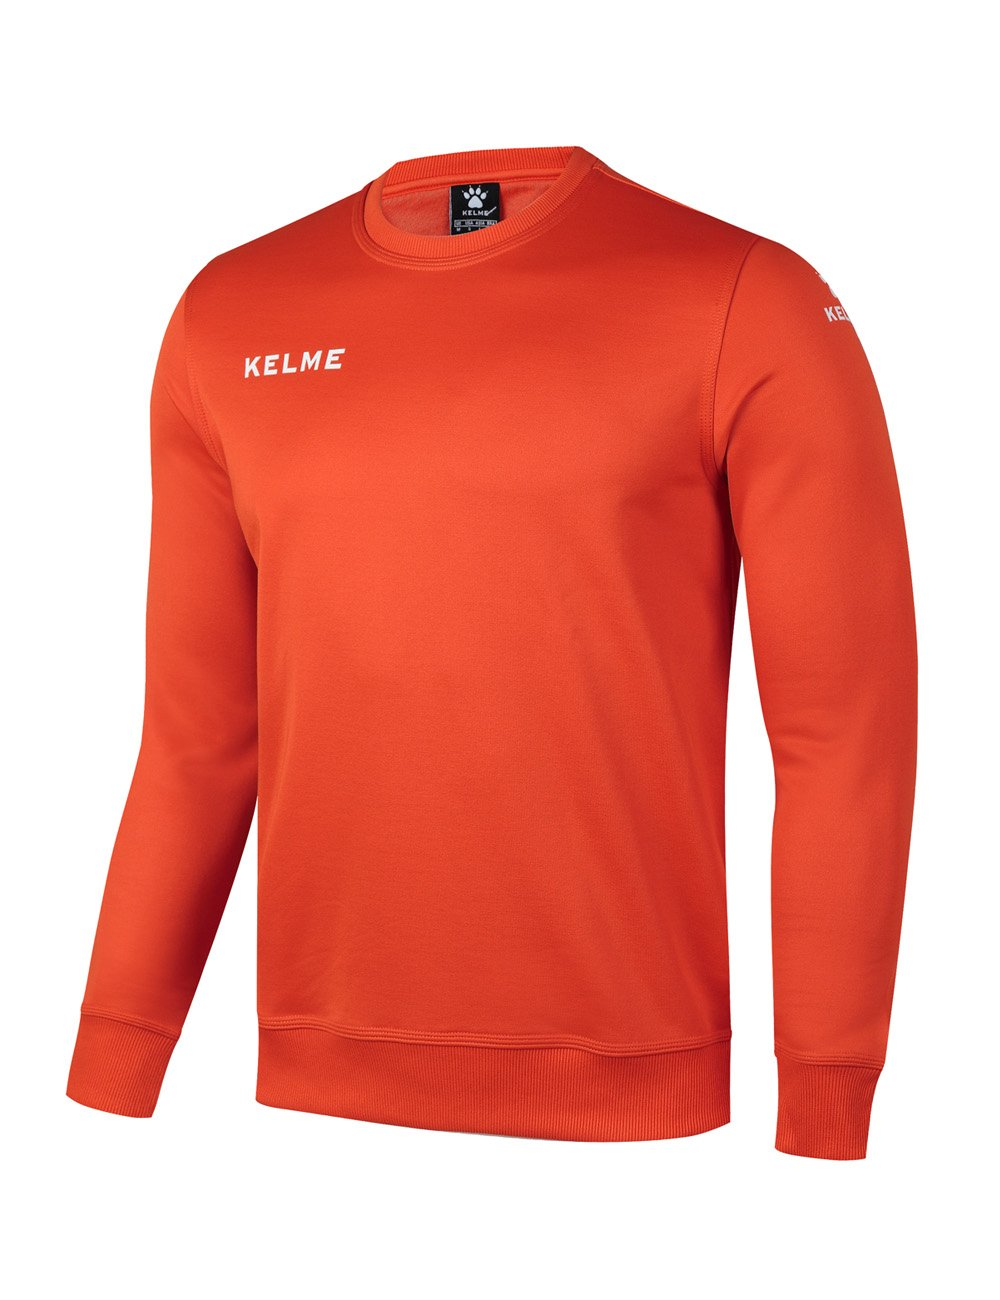 Classic Maglia Felpa Uomo Slim Fit Sweatshirt Calcio Team Club